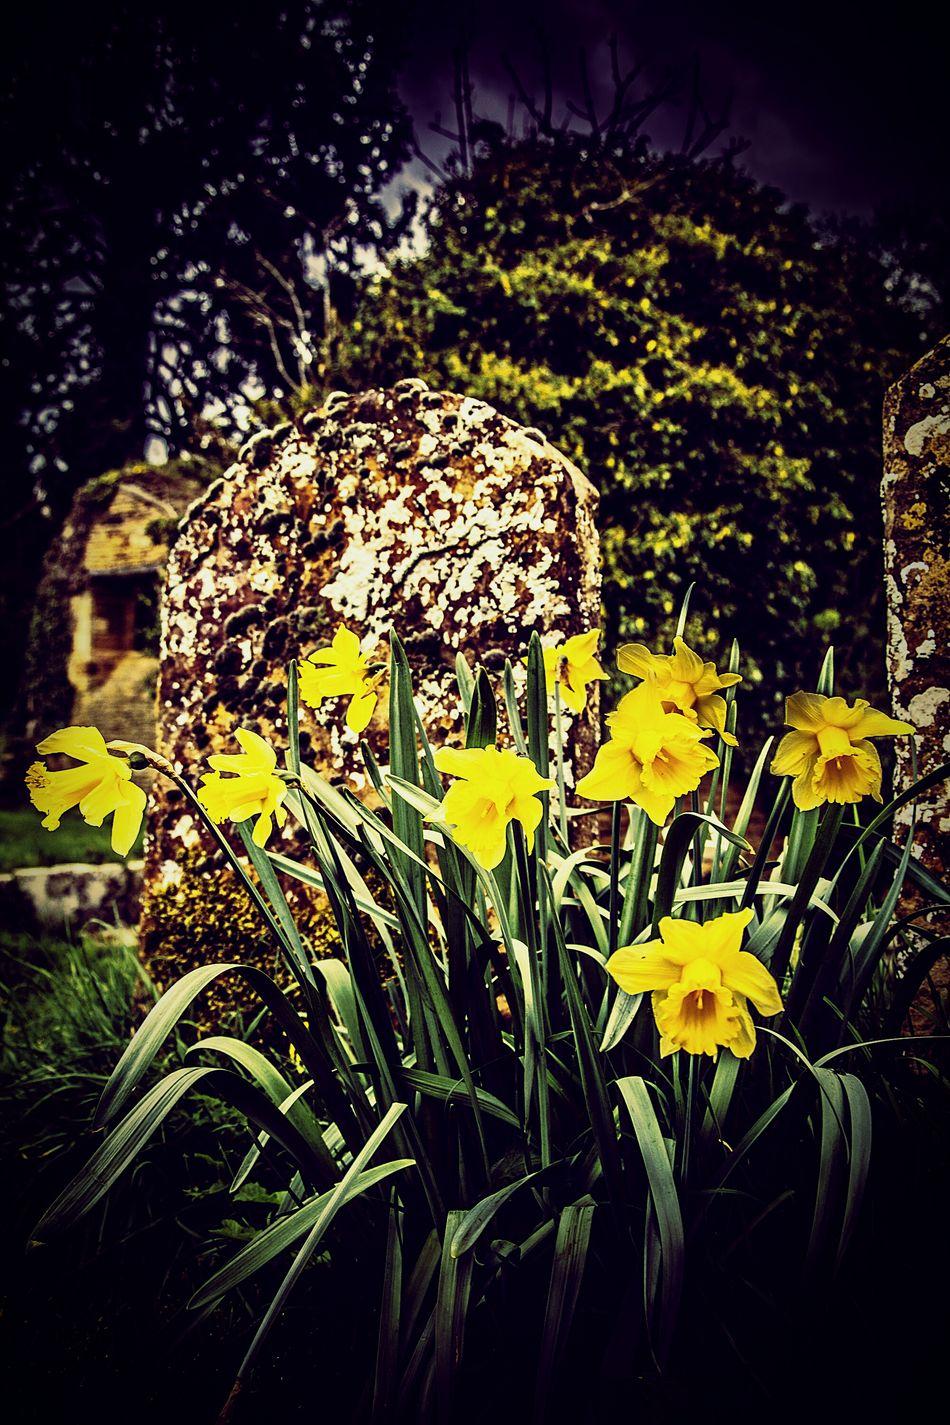 Daffodils in the graveyard of St John's Old Church, Boughton, Northamptonshire. Daffodils Daffodil Graveyard Church Ruins Boughton Northamptonshire Secret Garden